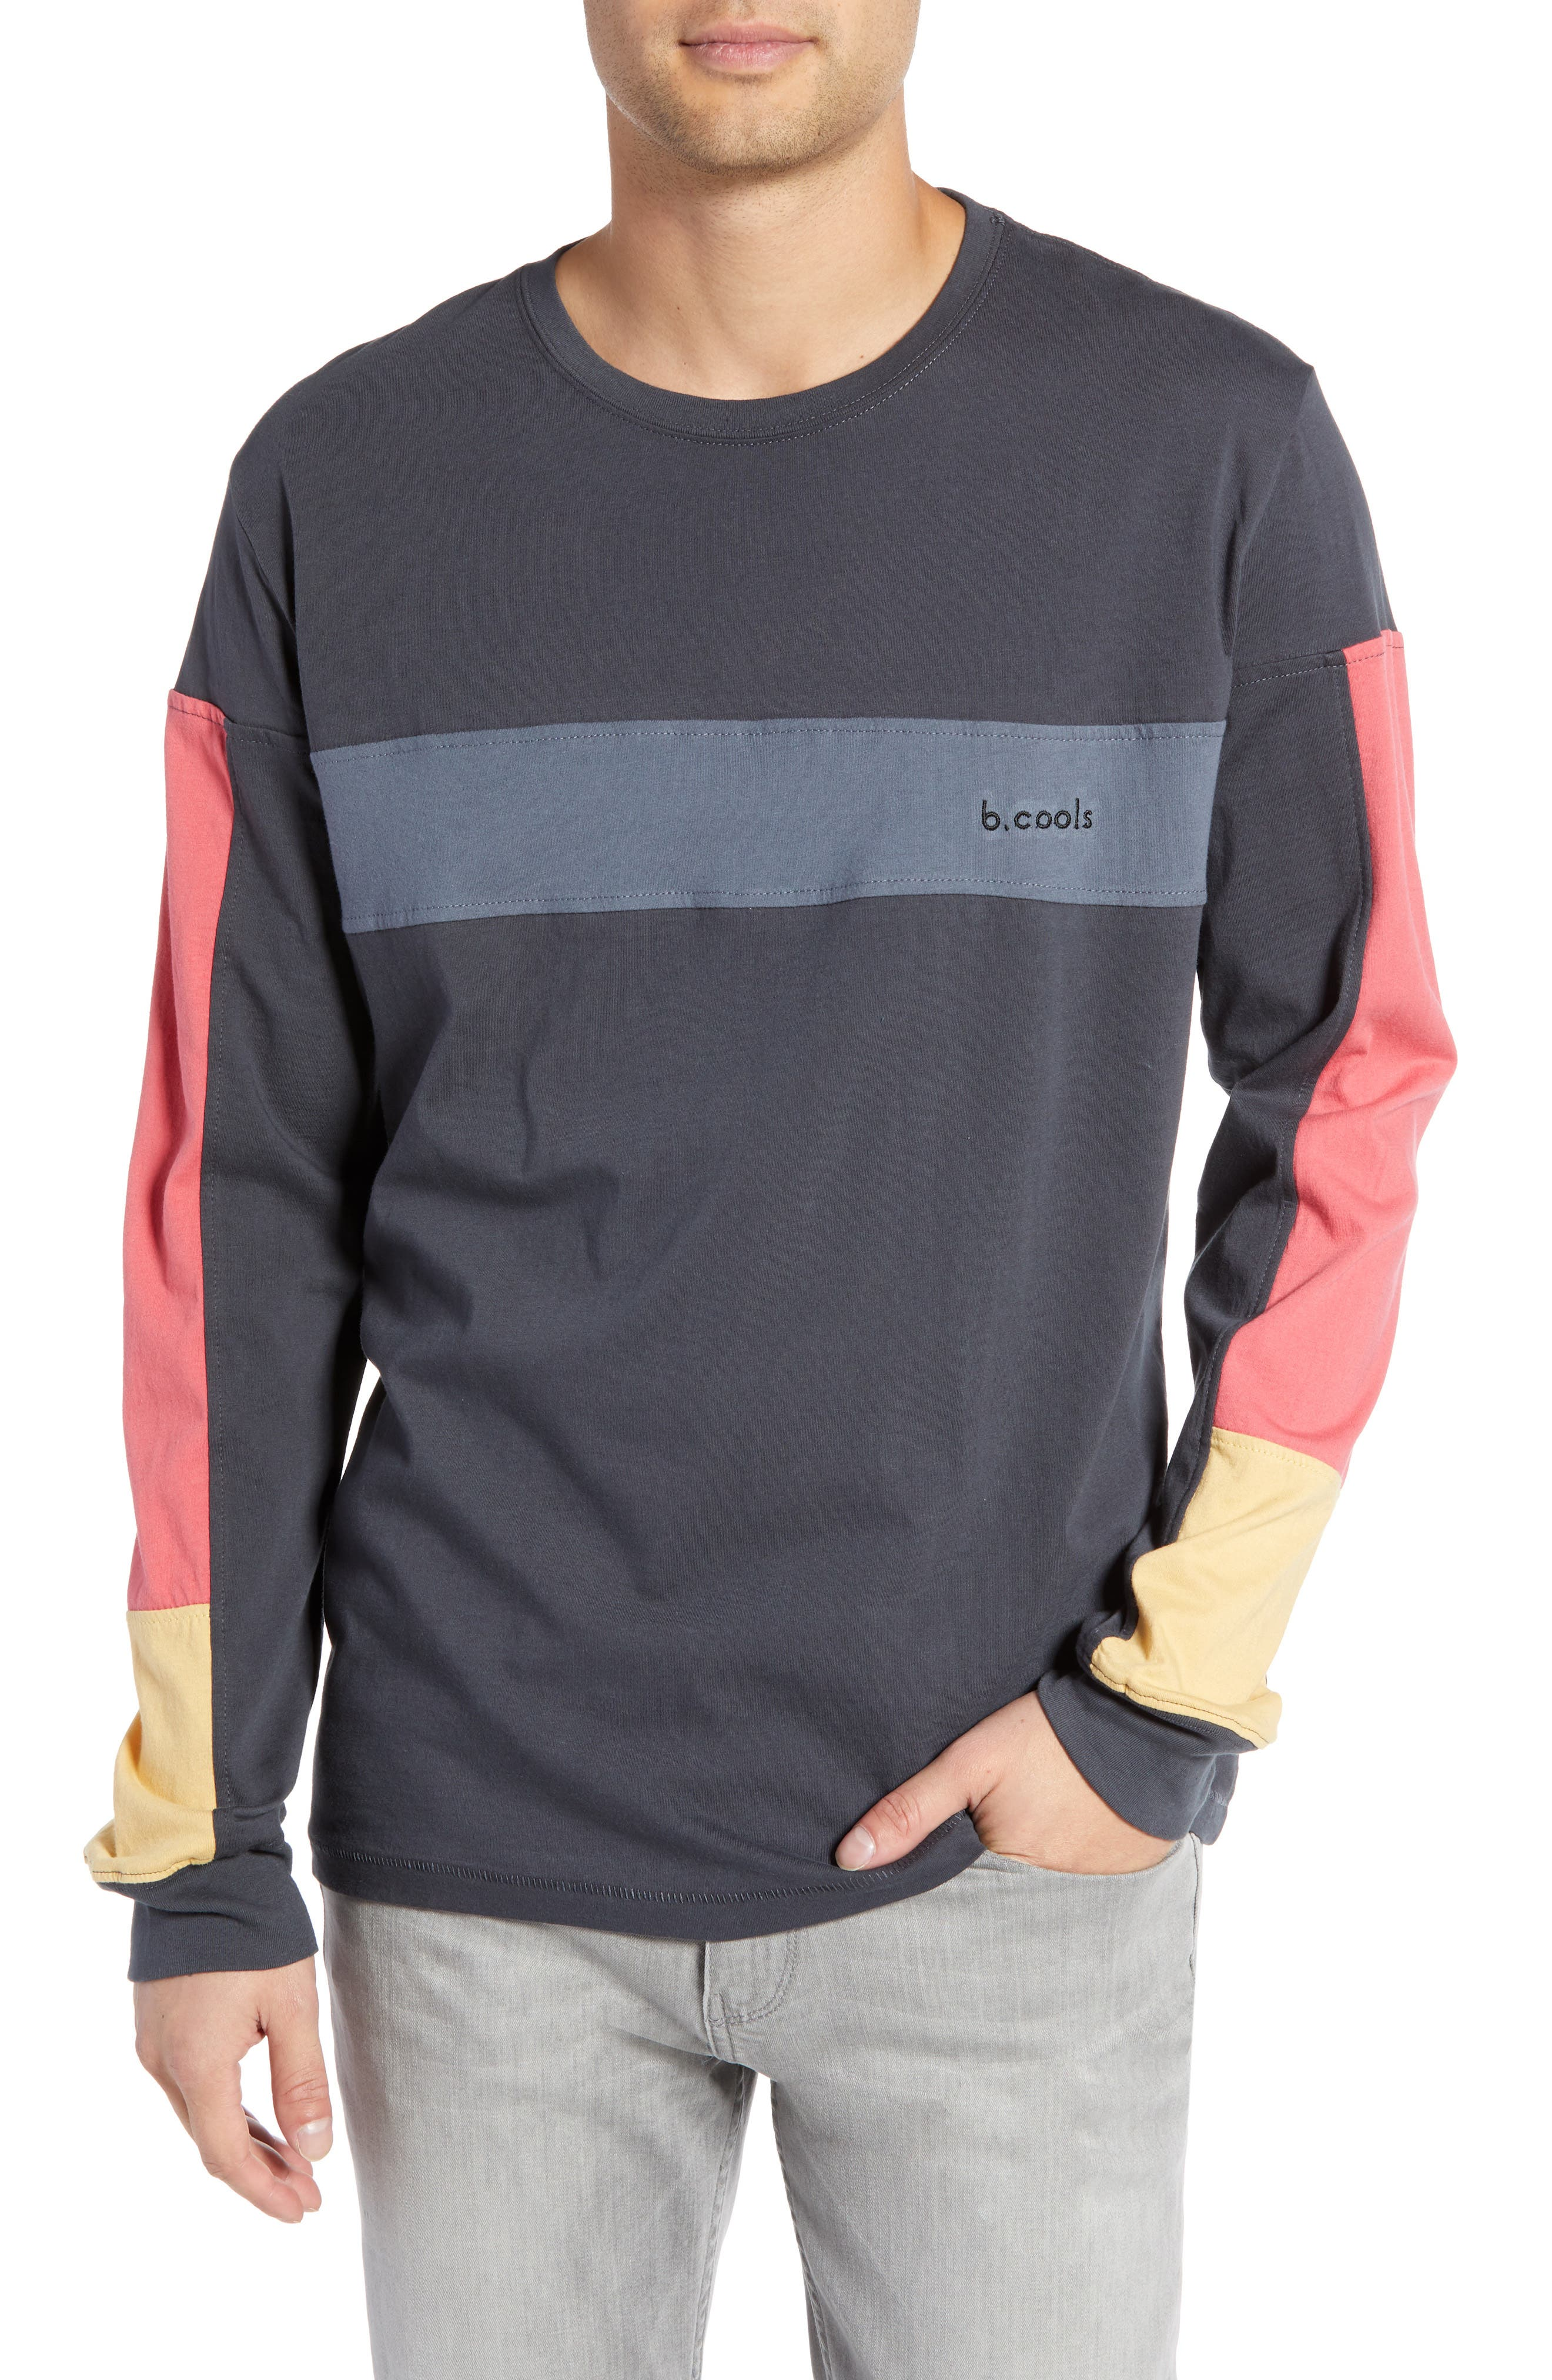 BARNEY COOLS B Quick Colorblock Long Sleeve T-Shirt, Main, color, 001